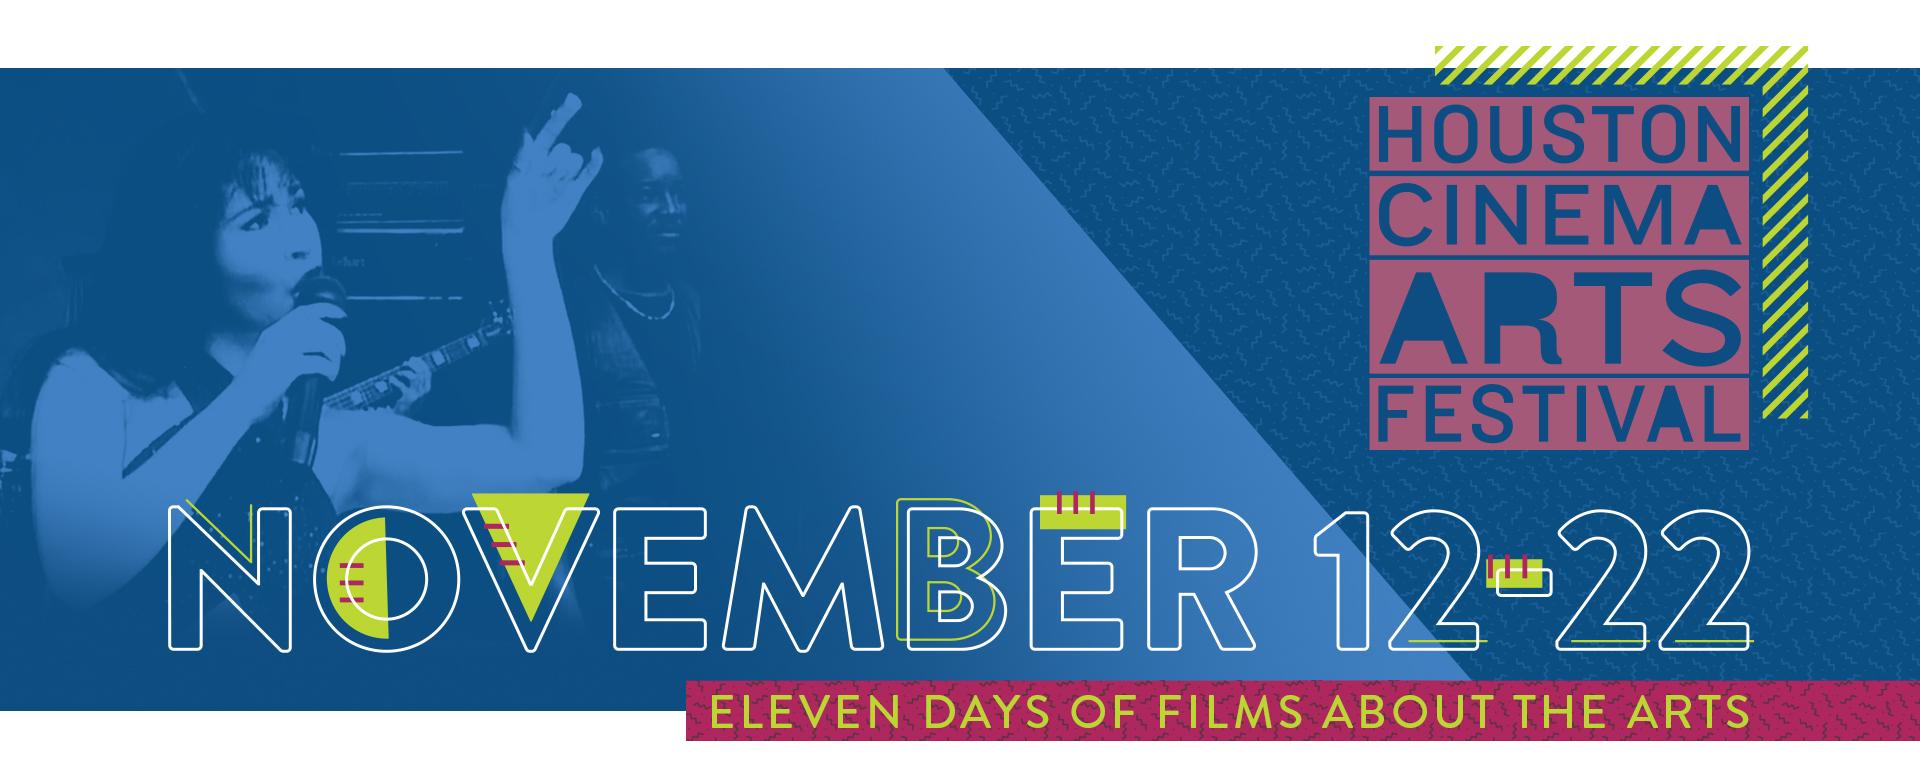 Houston Cinema Arts Festival 2020